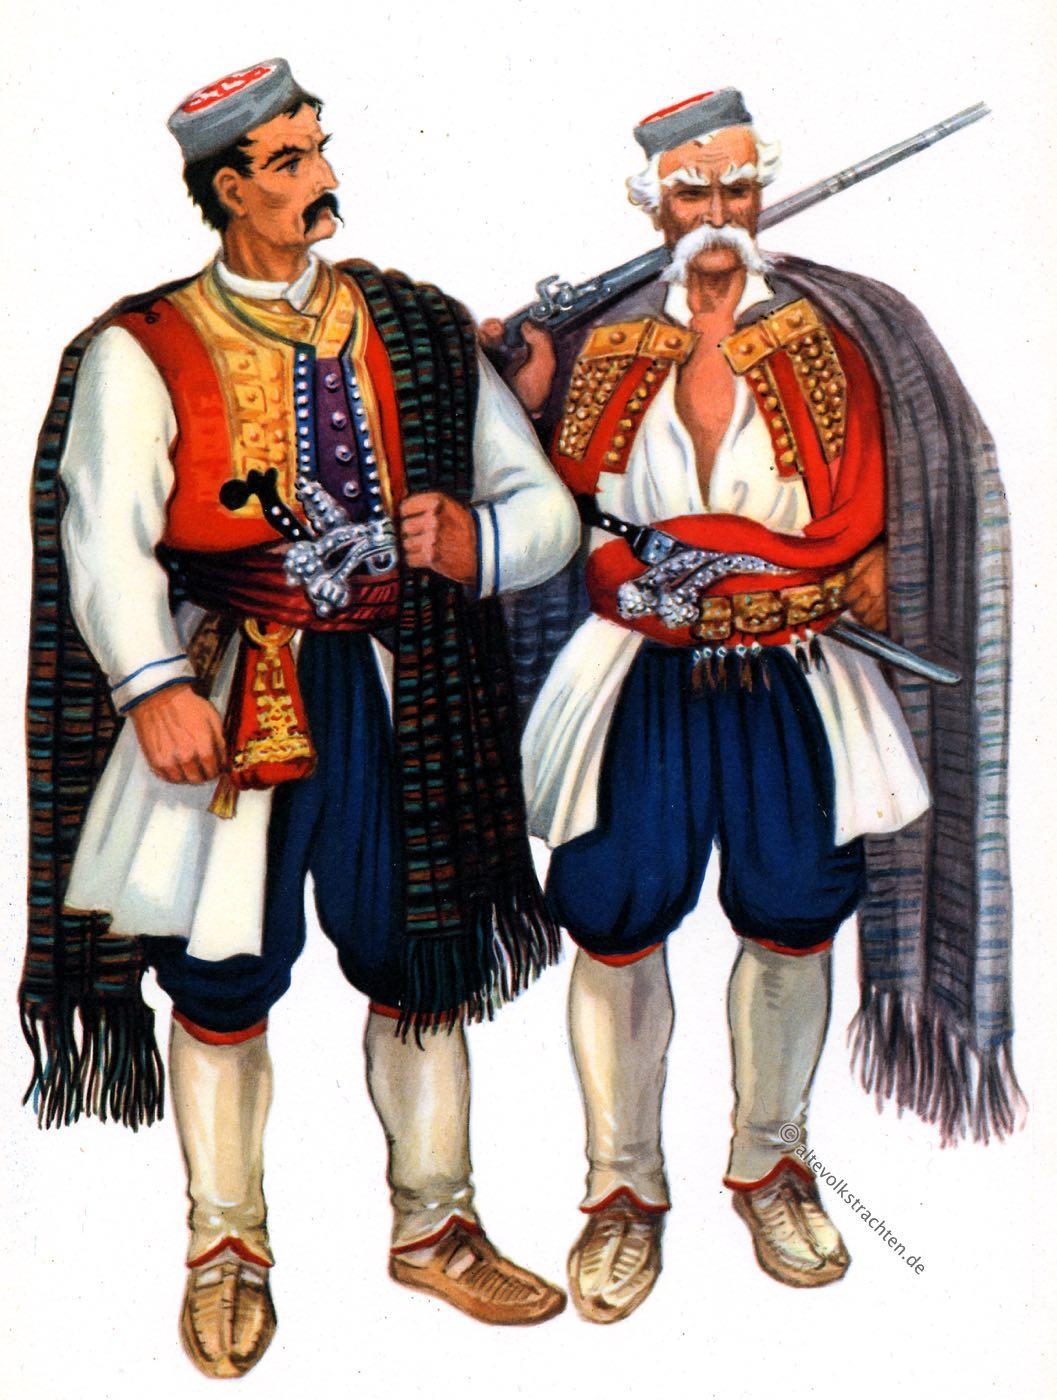 Krivošije, Montenegro, Trachten, Balkan, Kleider, Vladimir Kirin, Srpske, nacionalne, kostime